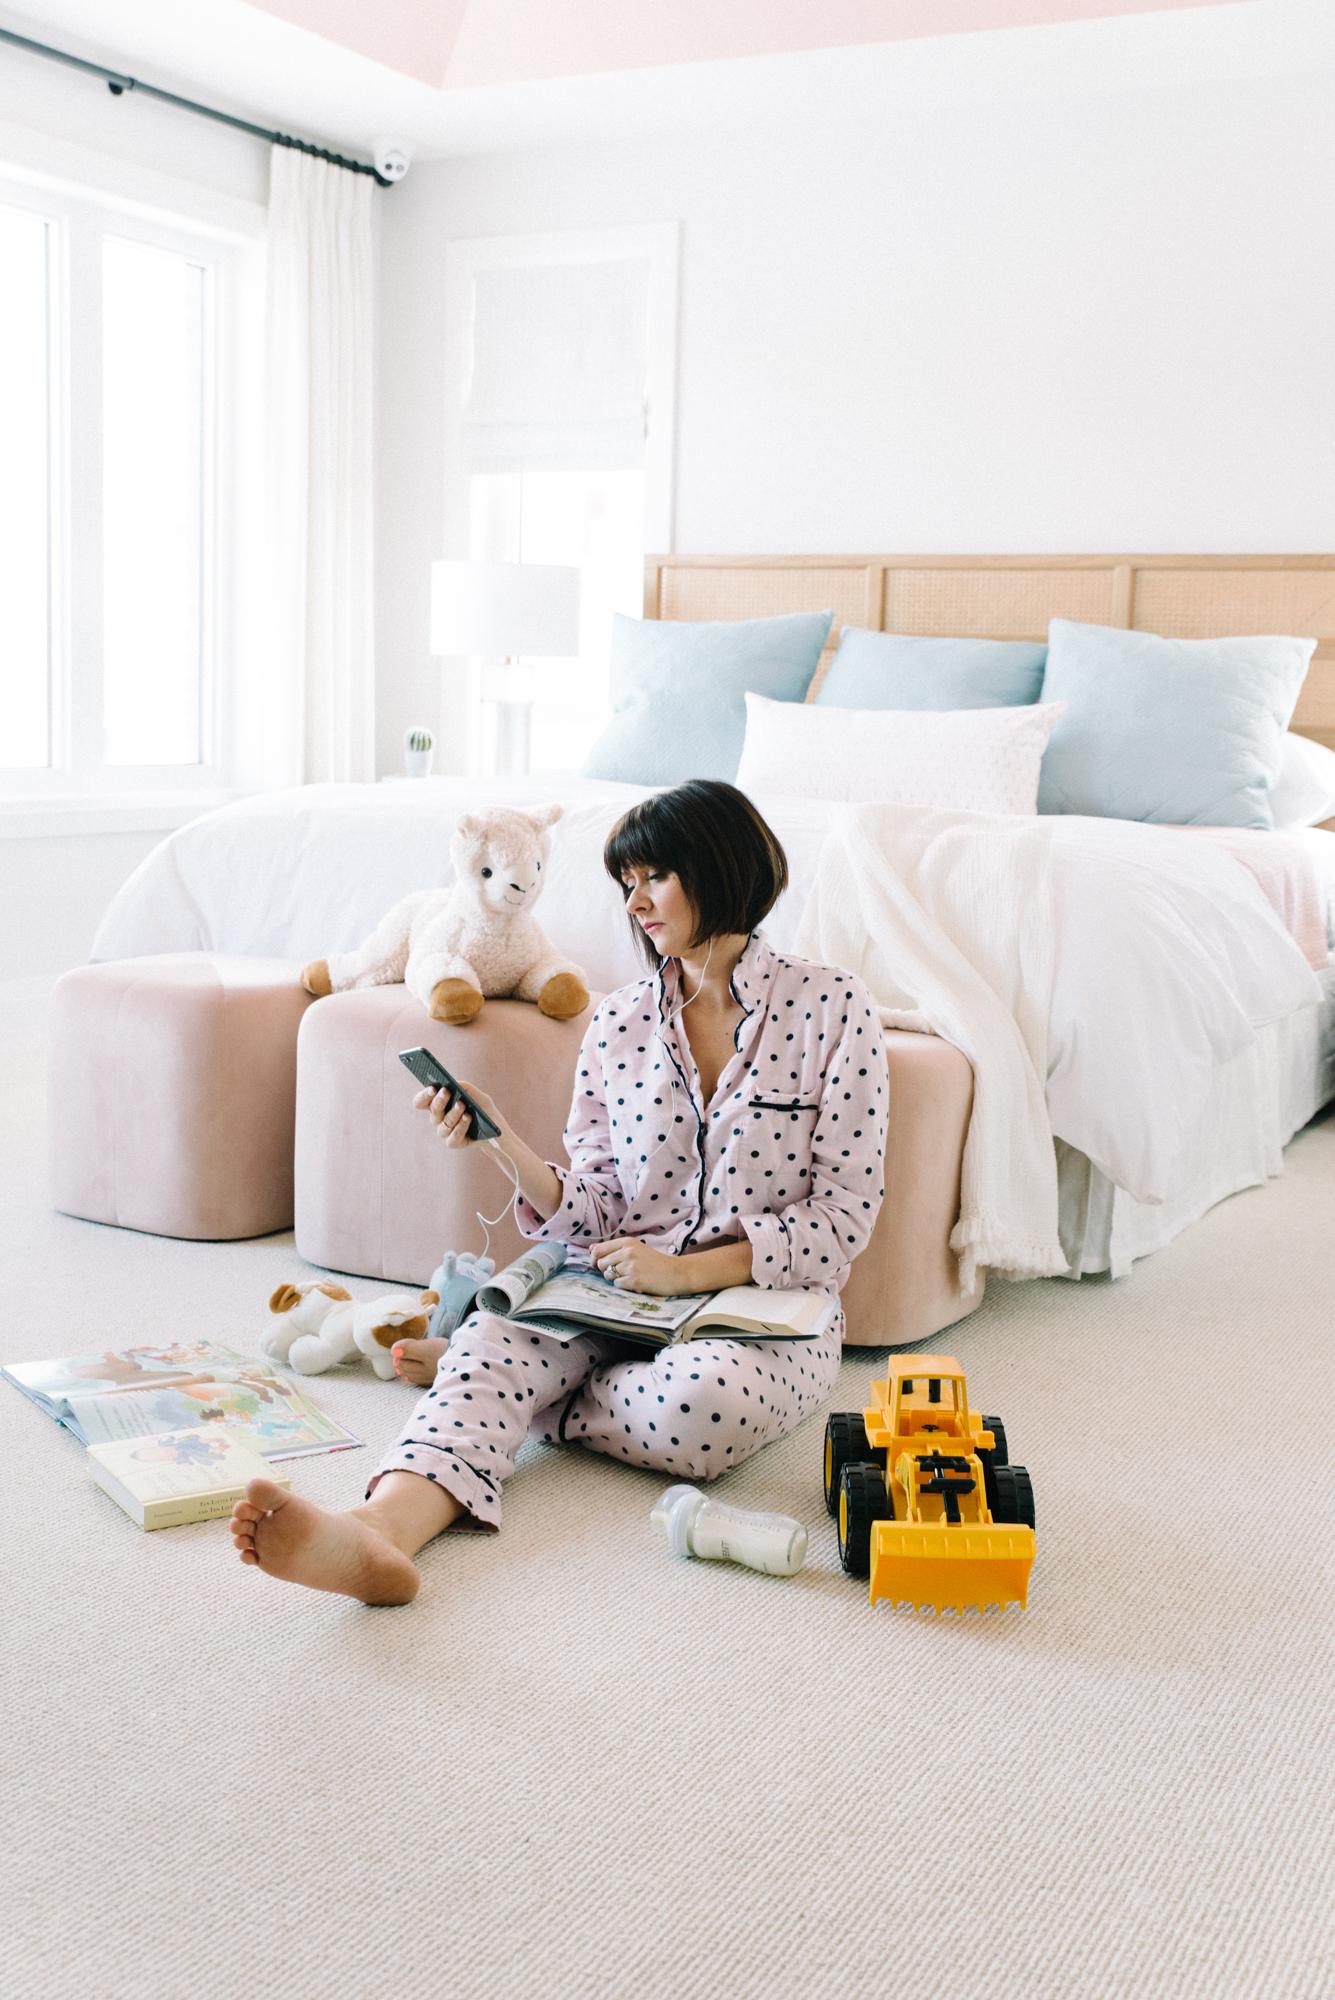 StefEthan-RebeccaHayDesigns-Aurora-InteriorDesigner-InteriorDesign-TorontoPortraitPhotographer-LifestylePhotography-TorontoInteriorDesigner-19.JPG